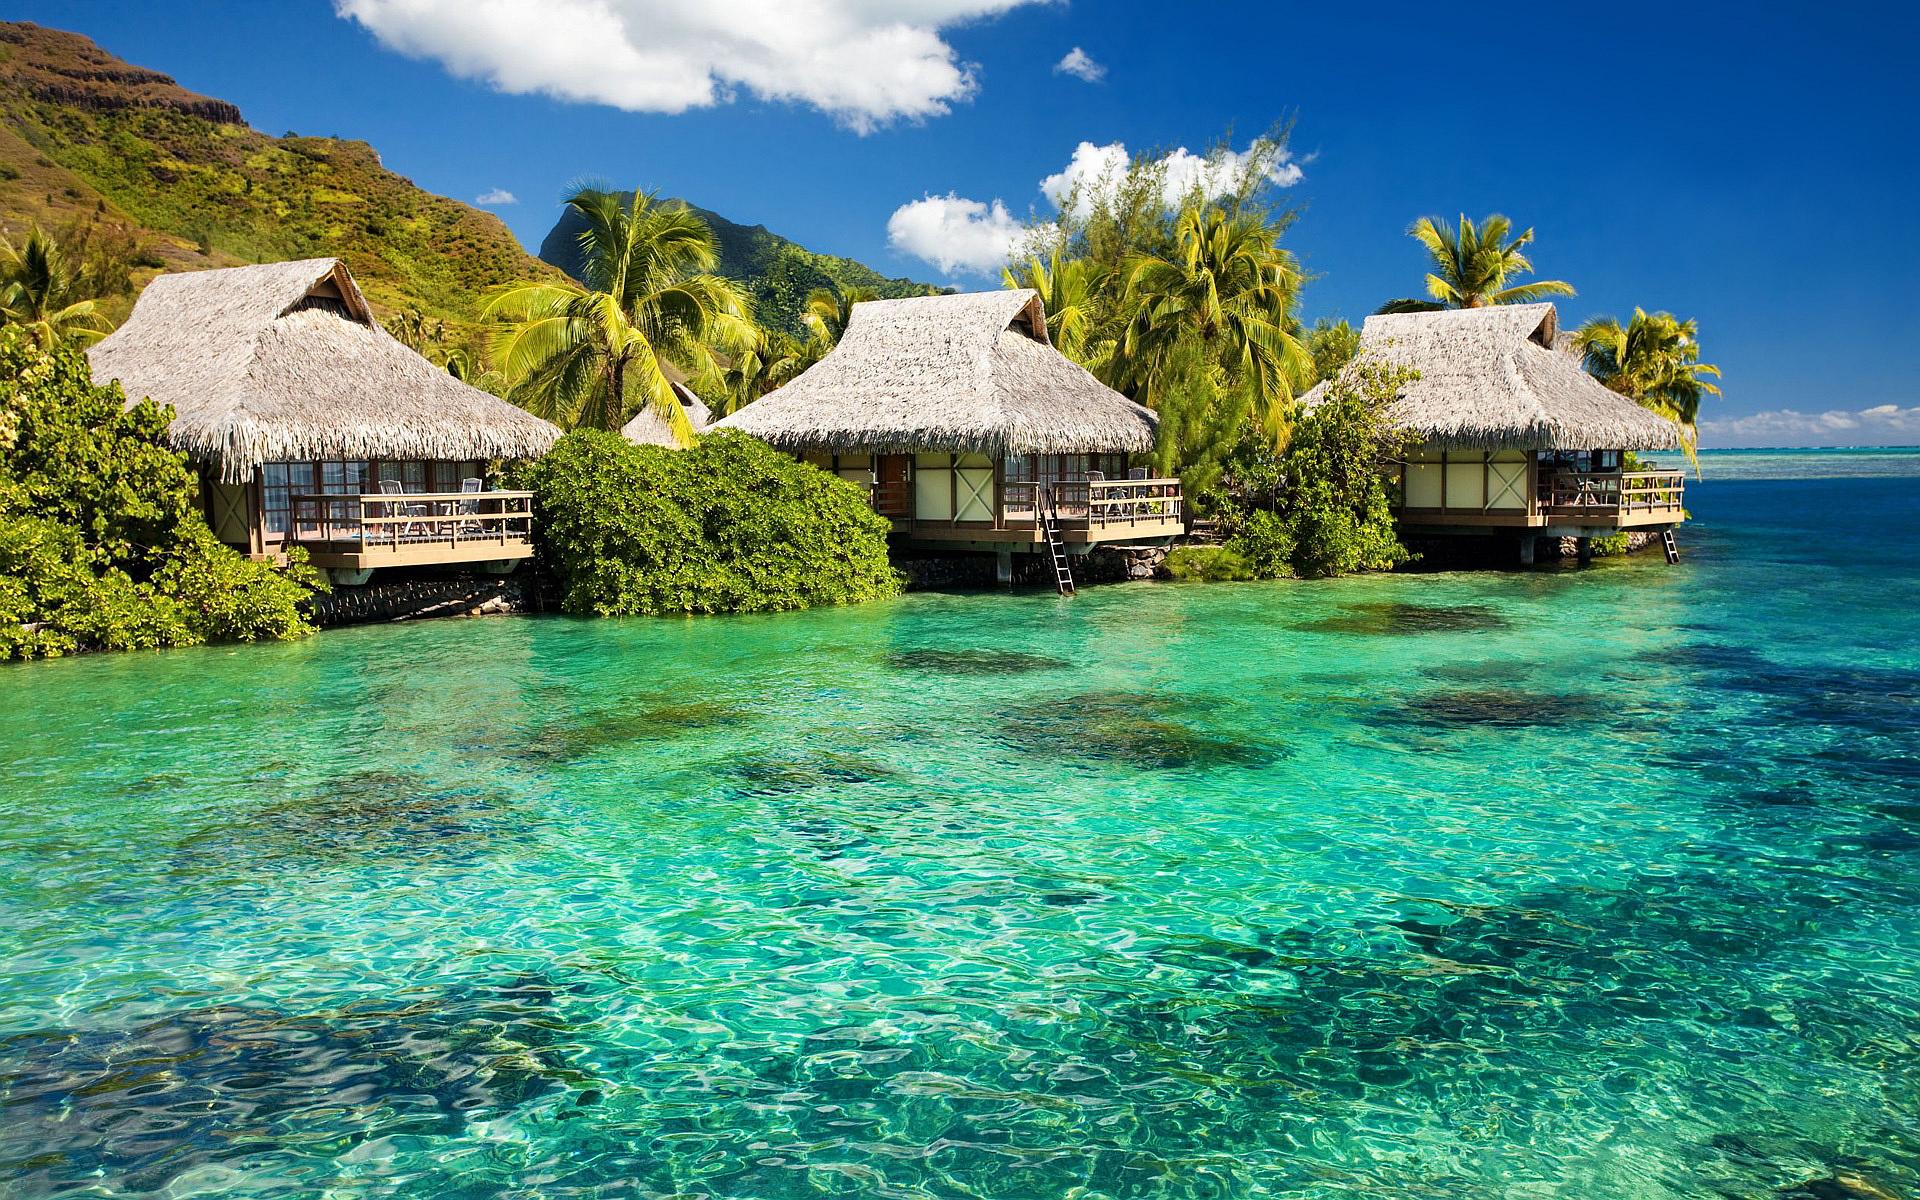 Aruba Beach Bungalow The Best Beaches In World